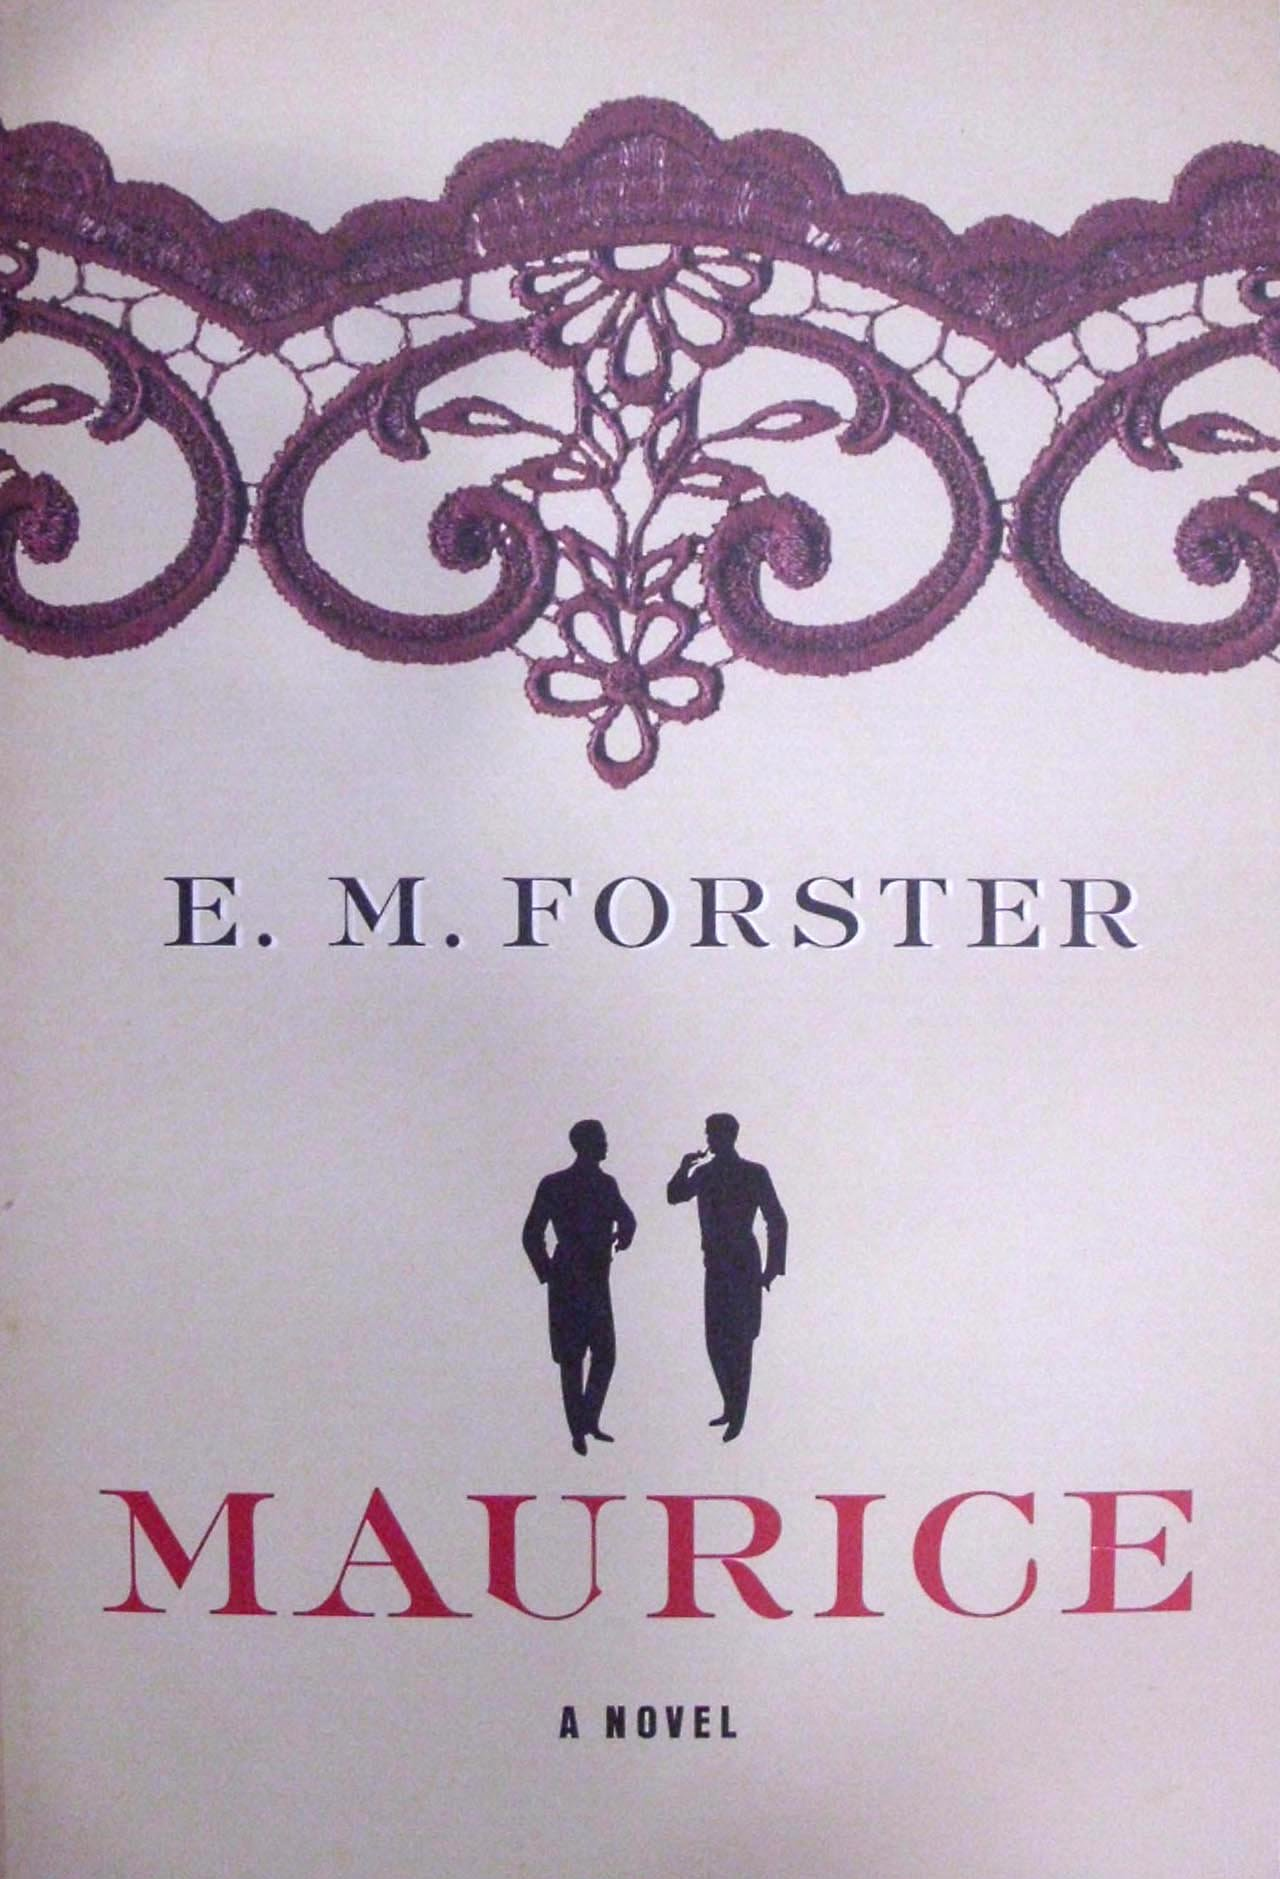 Amazon.com: Maurice: A Novel (9780393310320): Forster, E. M.: Books